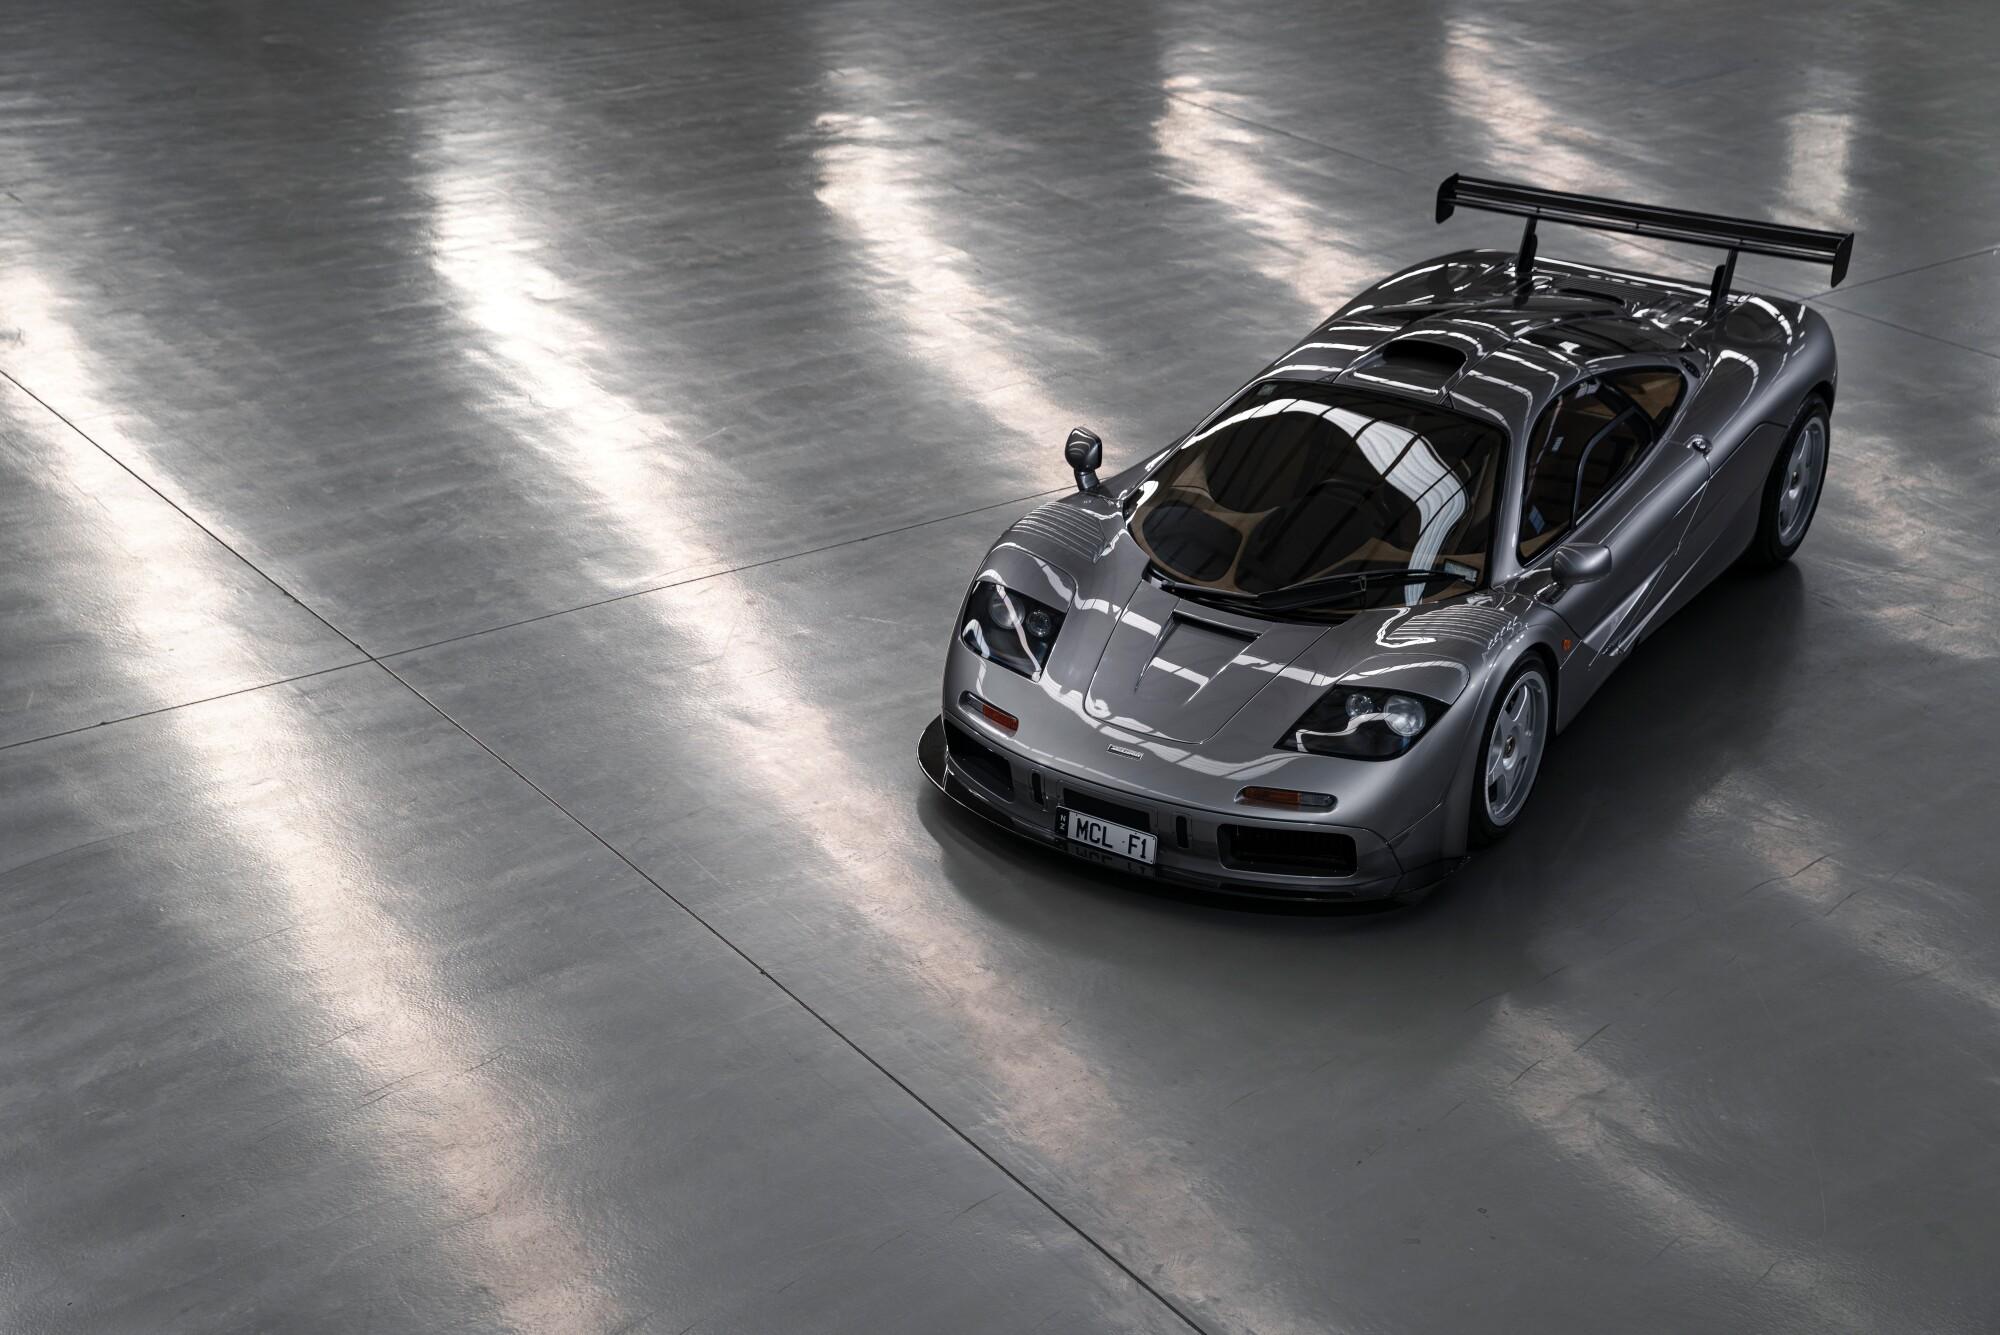 1994-McLaren-F1--LM-Specification-1.jpg